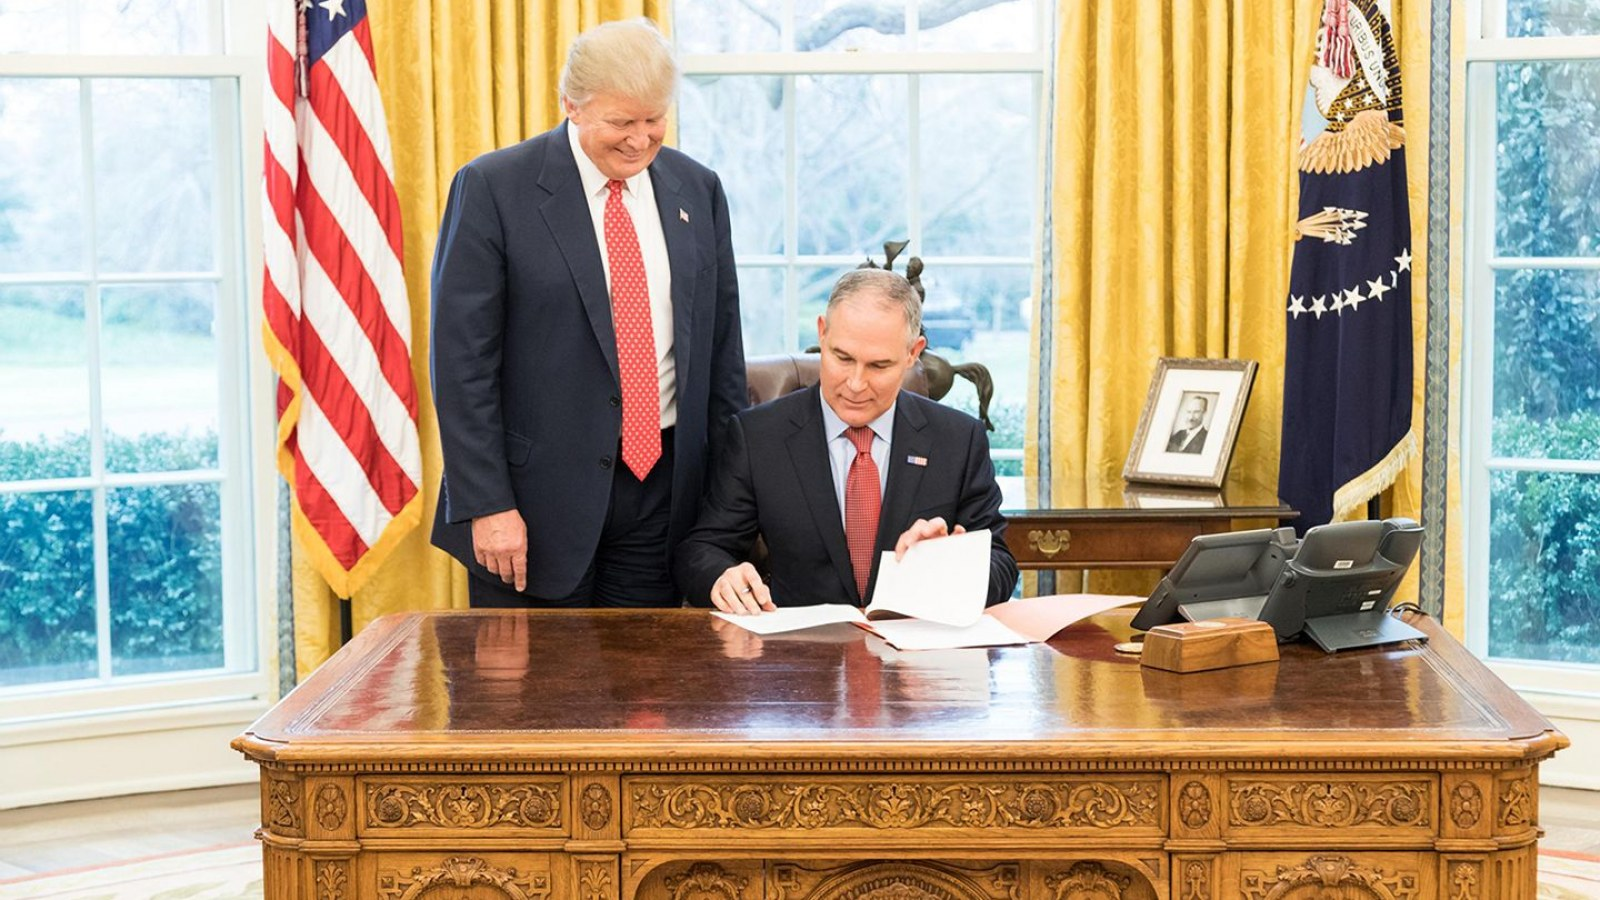 How the EPA's Scott Pruitt Became the Most Dangerous Member